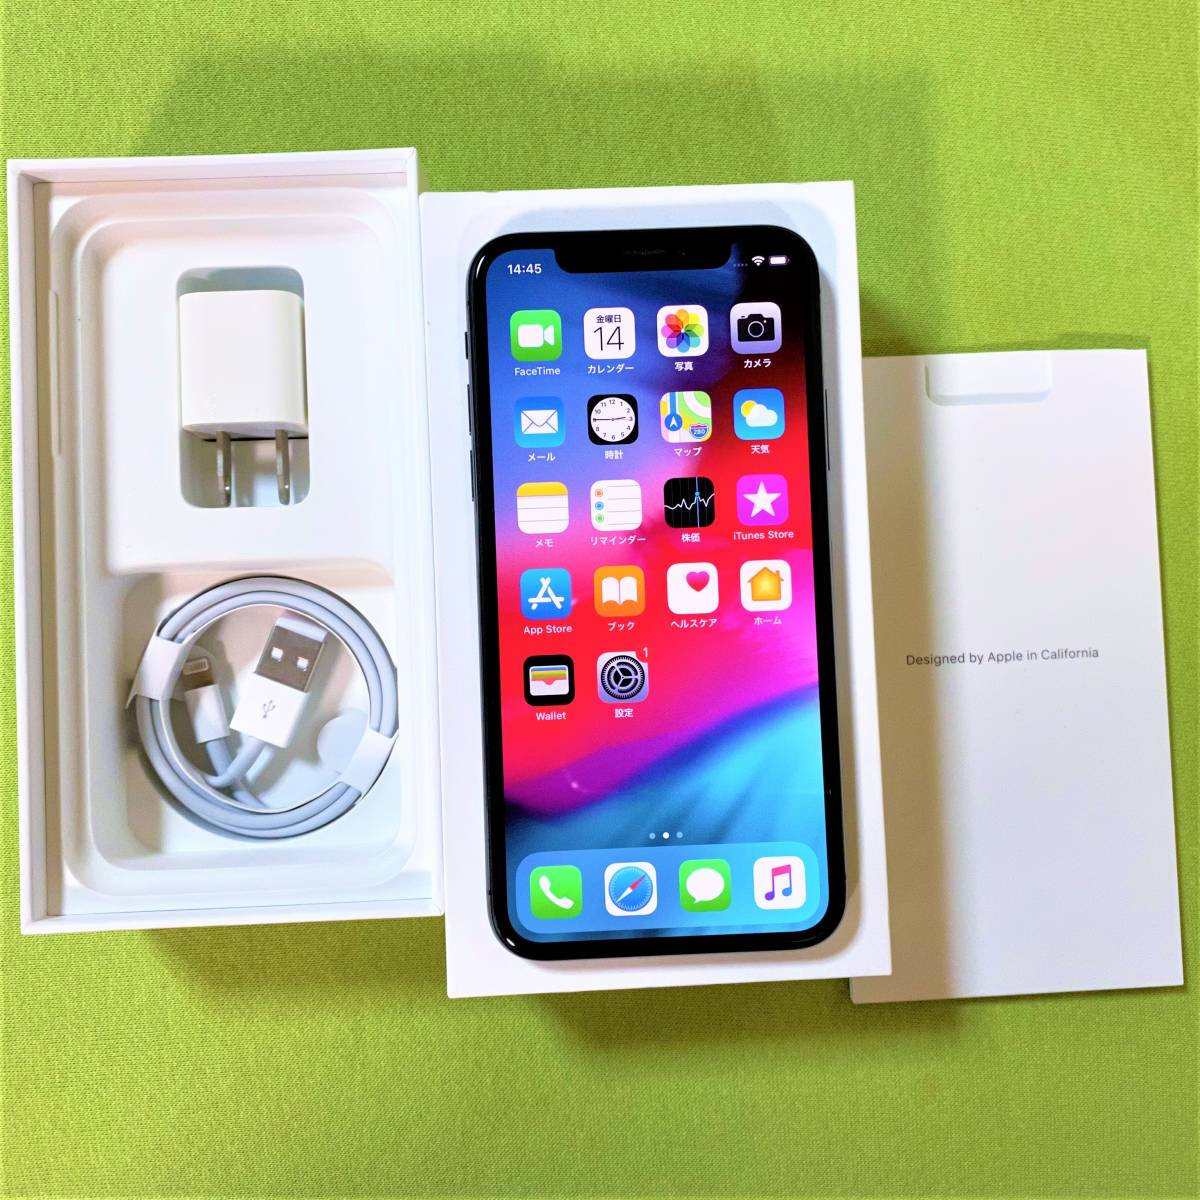 SIMフリー iPhone X スペースグレイ 256GB MQC12J/A iOS12.4.1 バッテリー最大容量100% docomo 格安SIM MVNO 海外利用可能